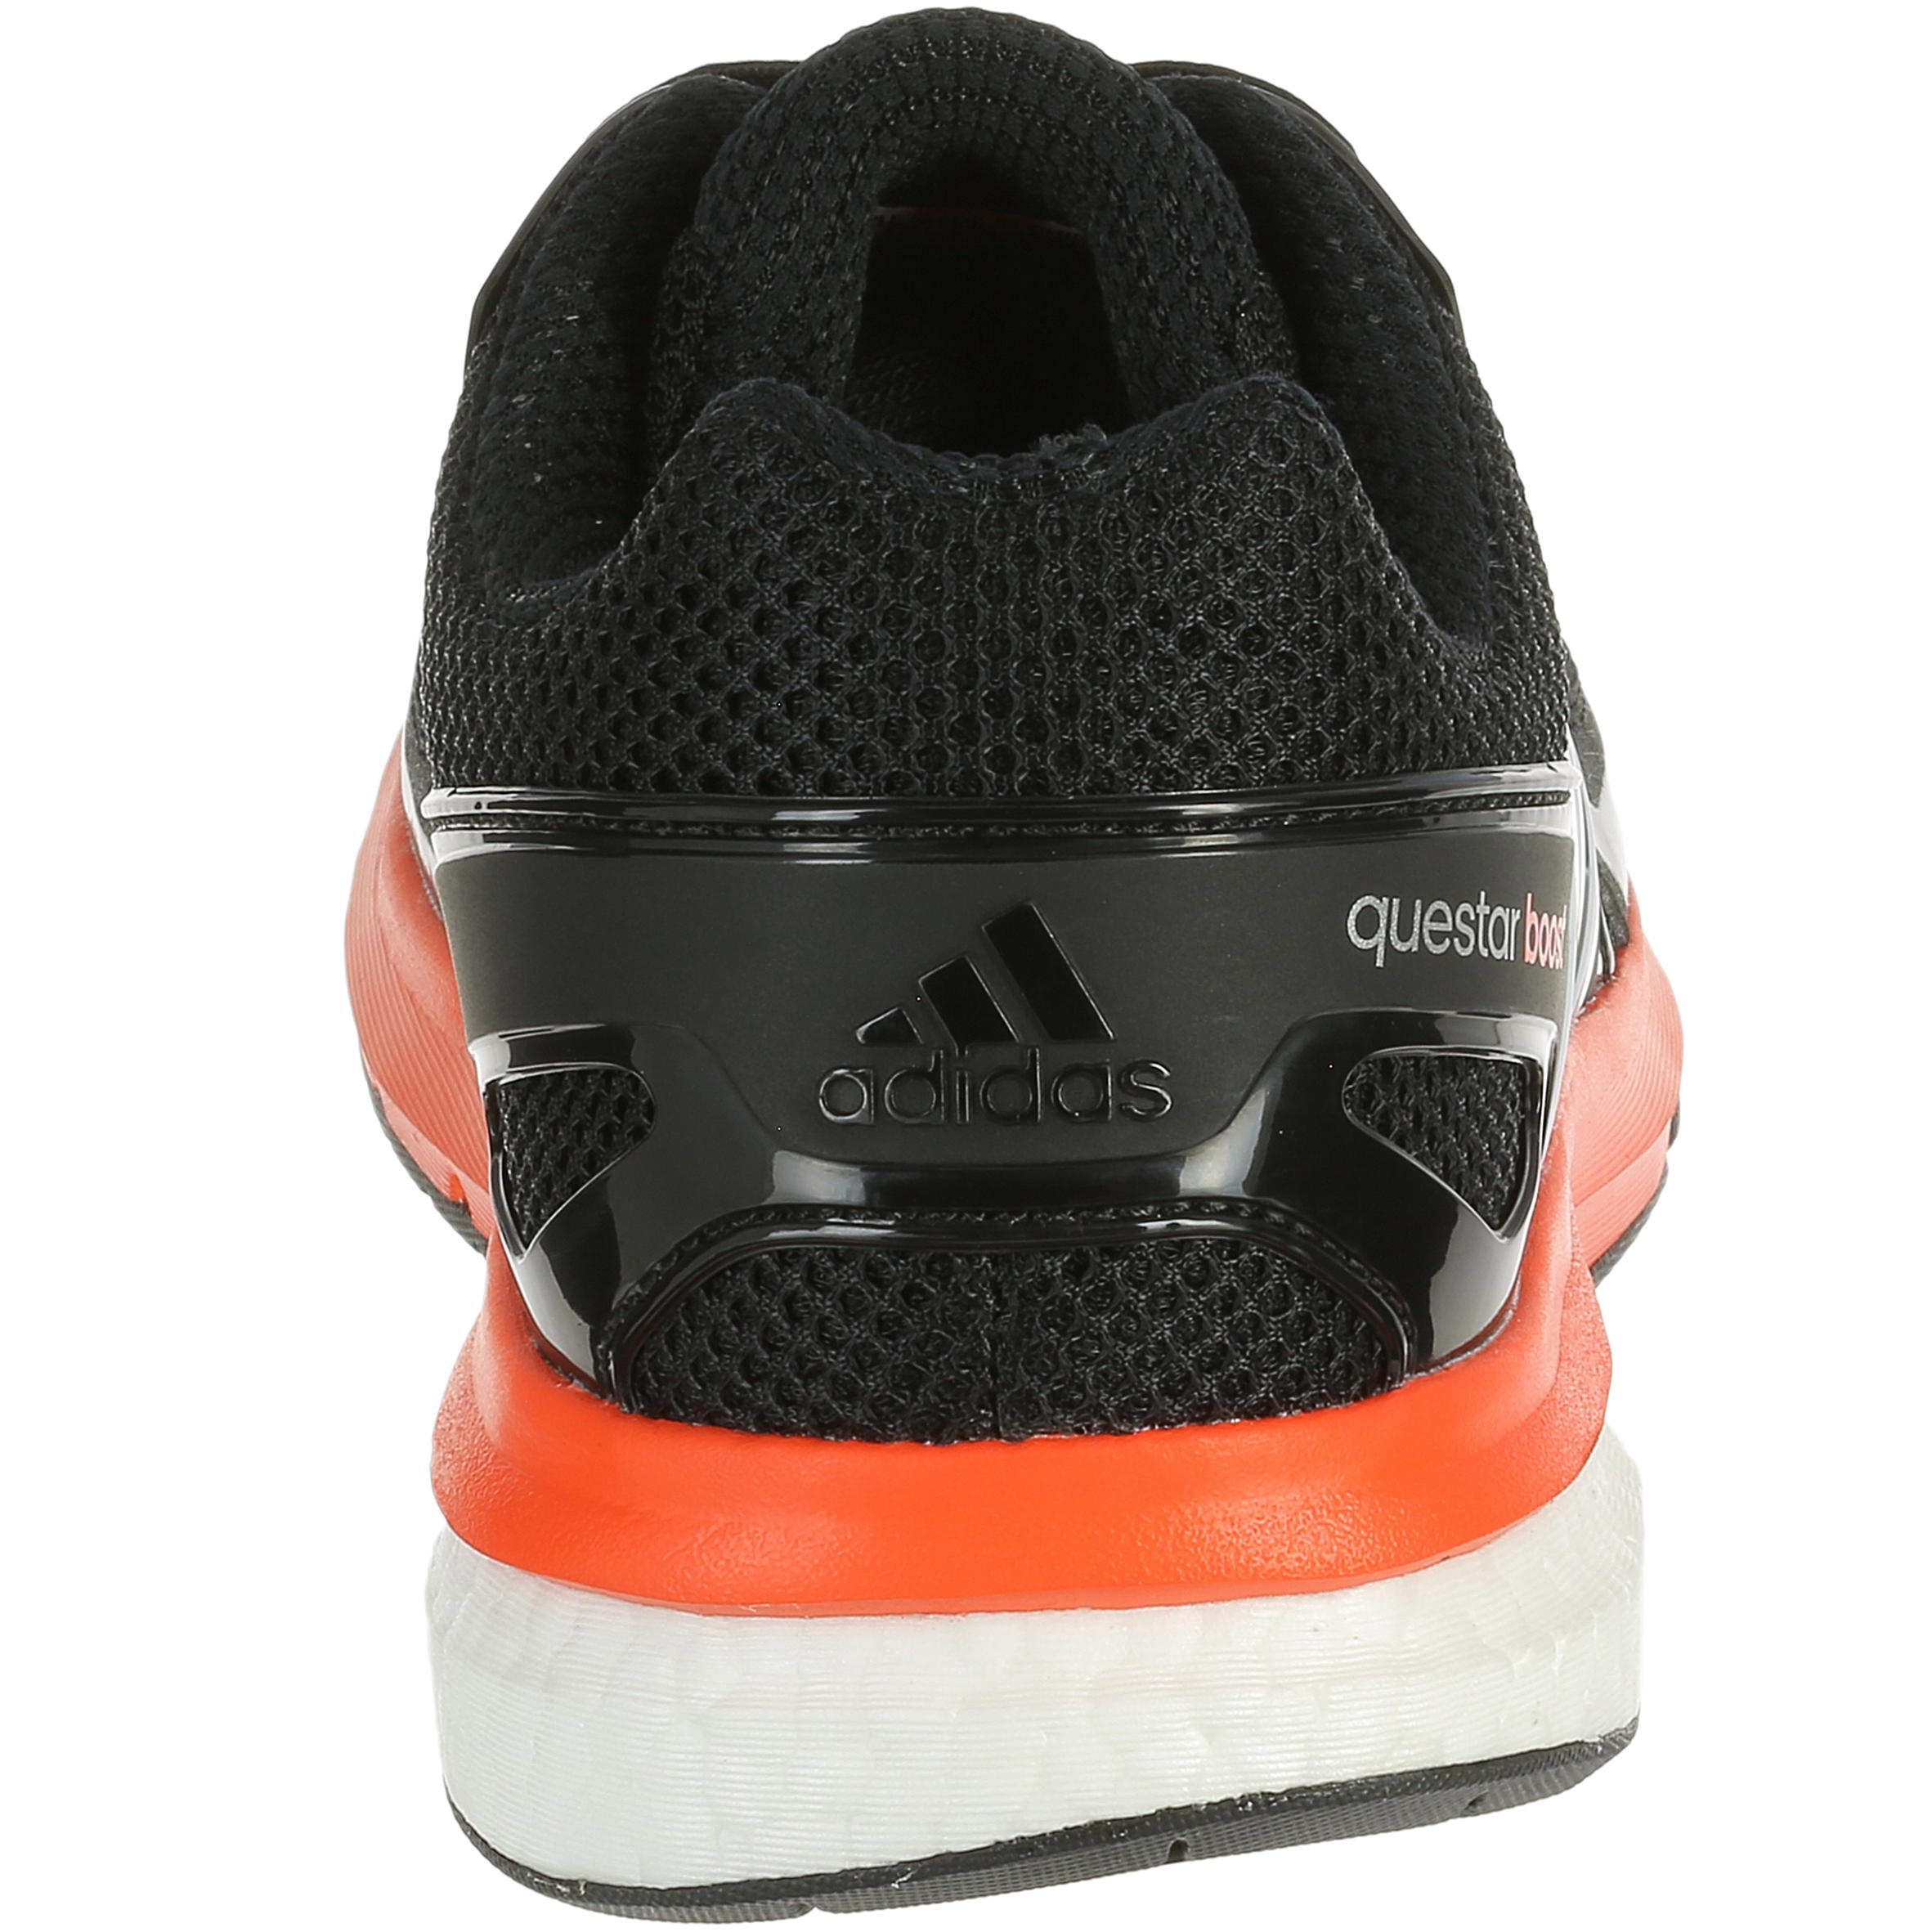 Chaussure Running Homme Questar Noir Orange Adidas T1FclKJ